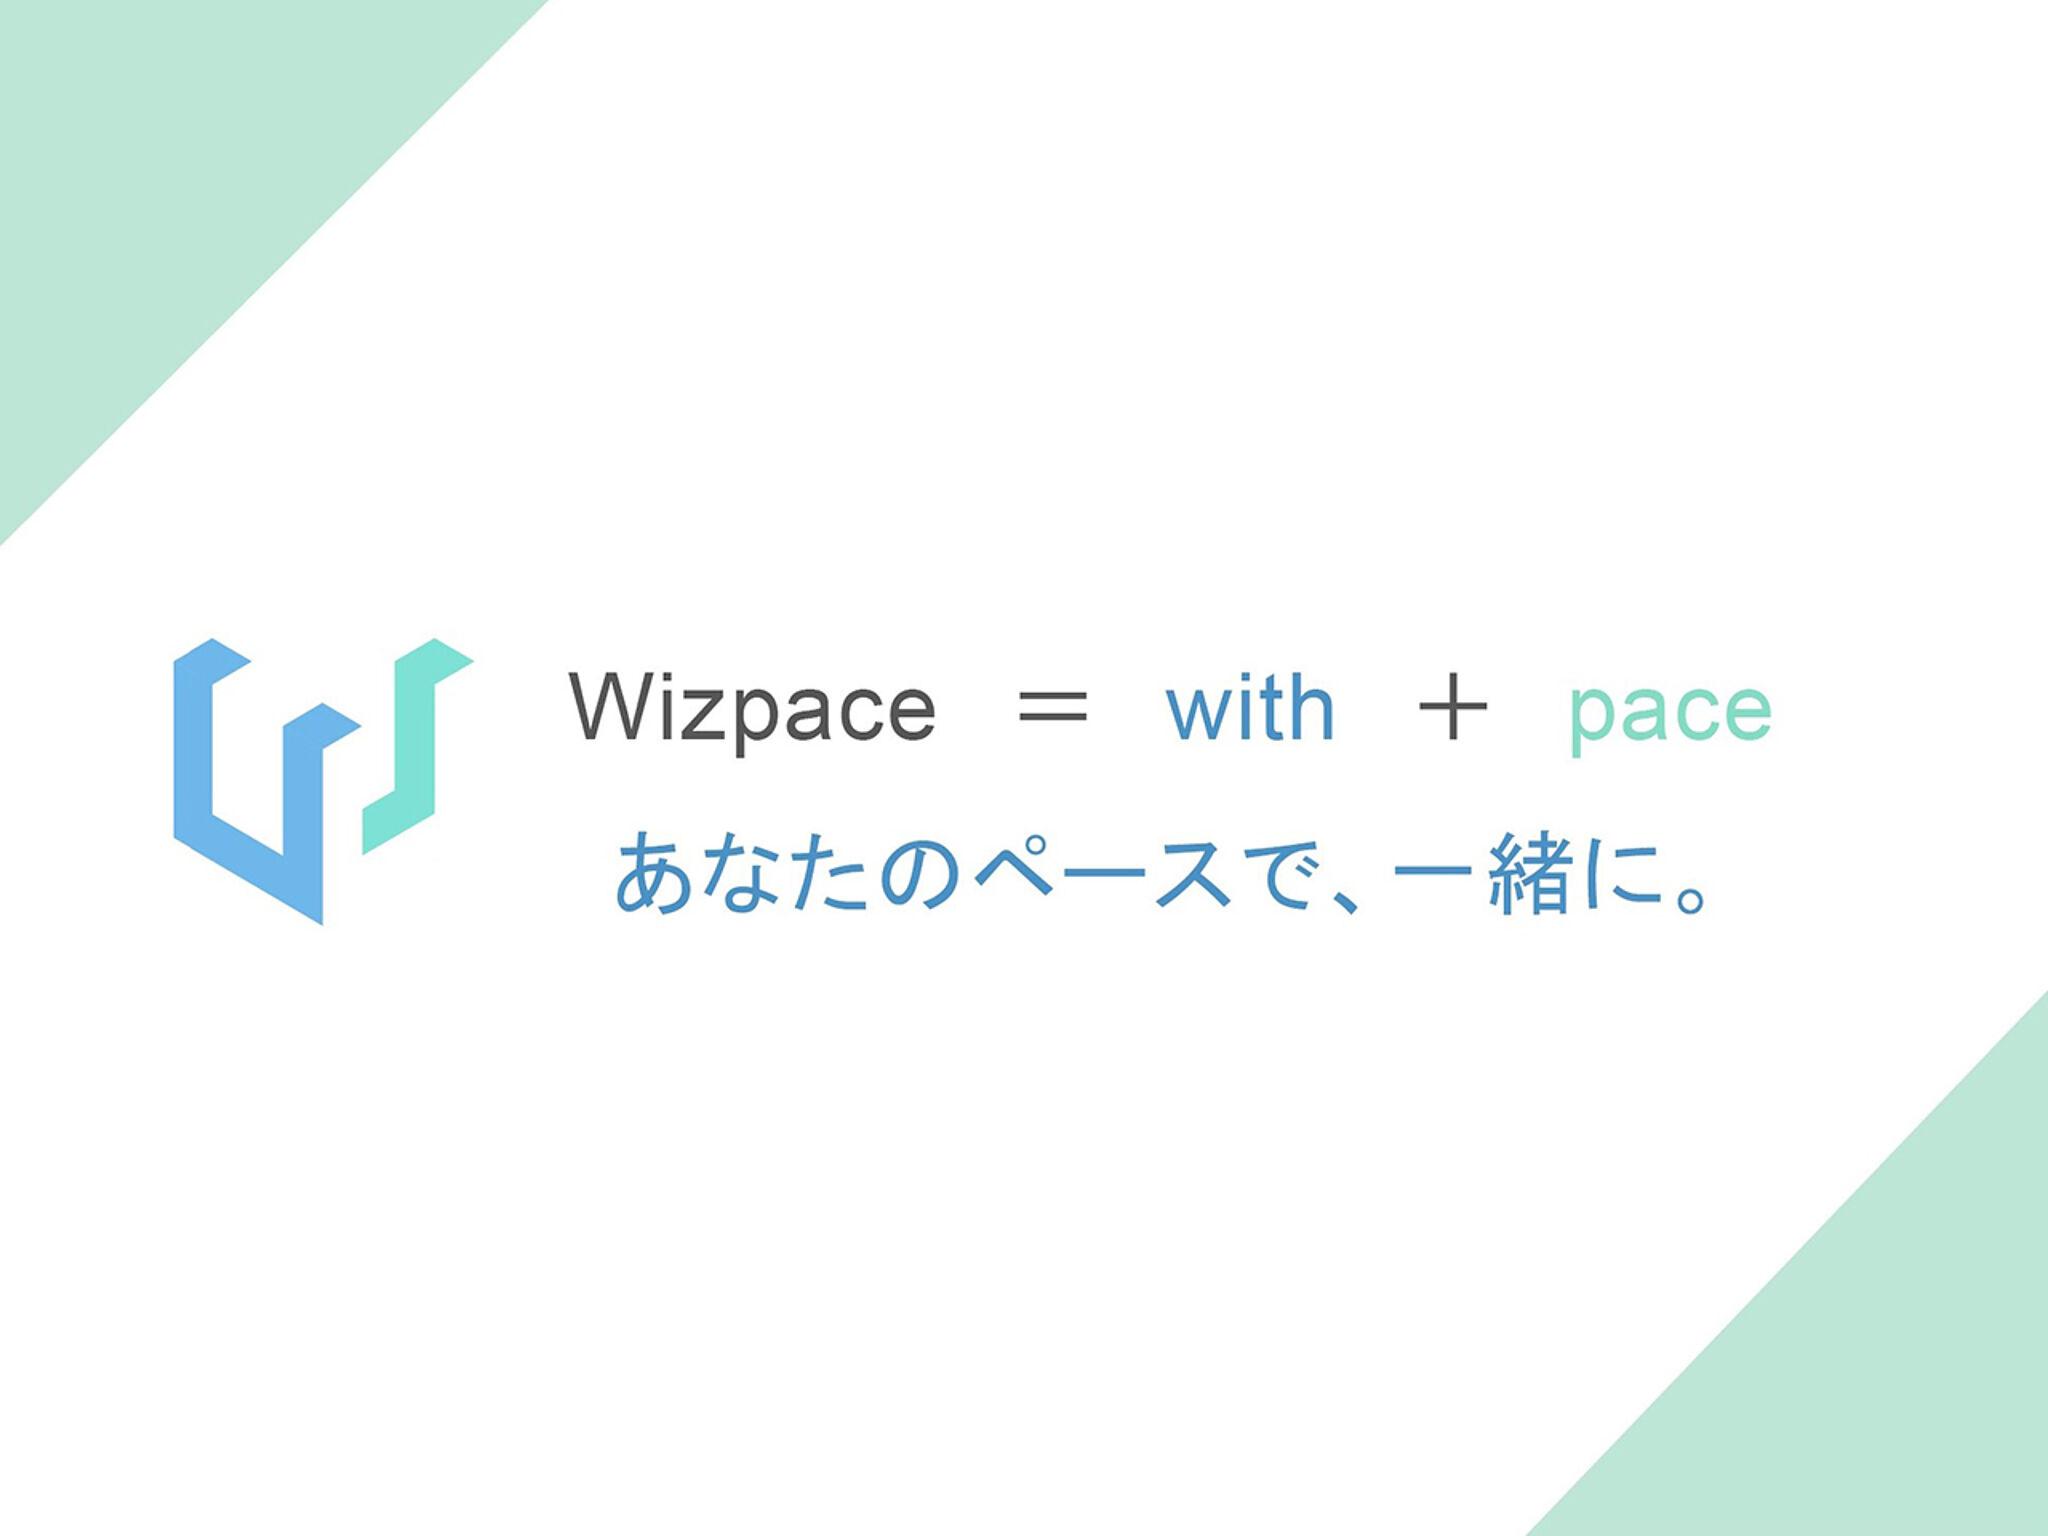 学習管理塾Wizpaceの理念